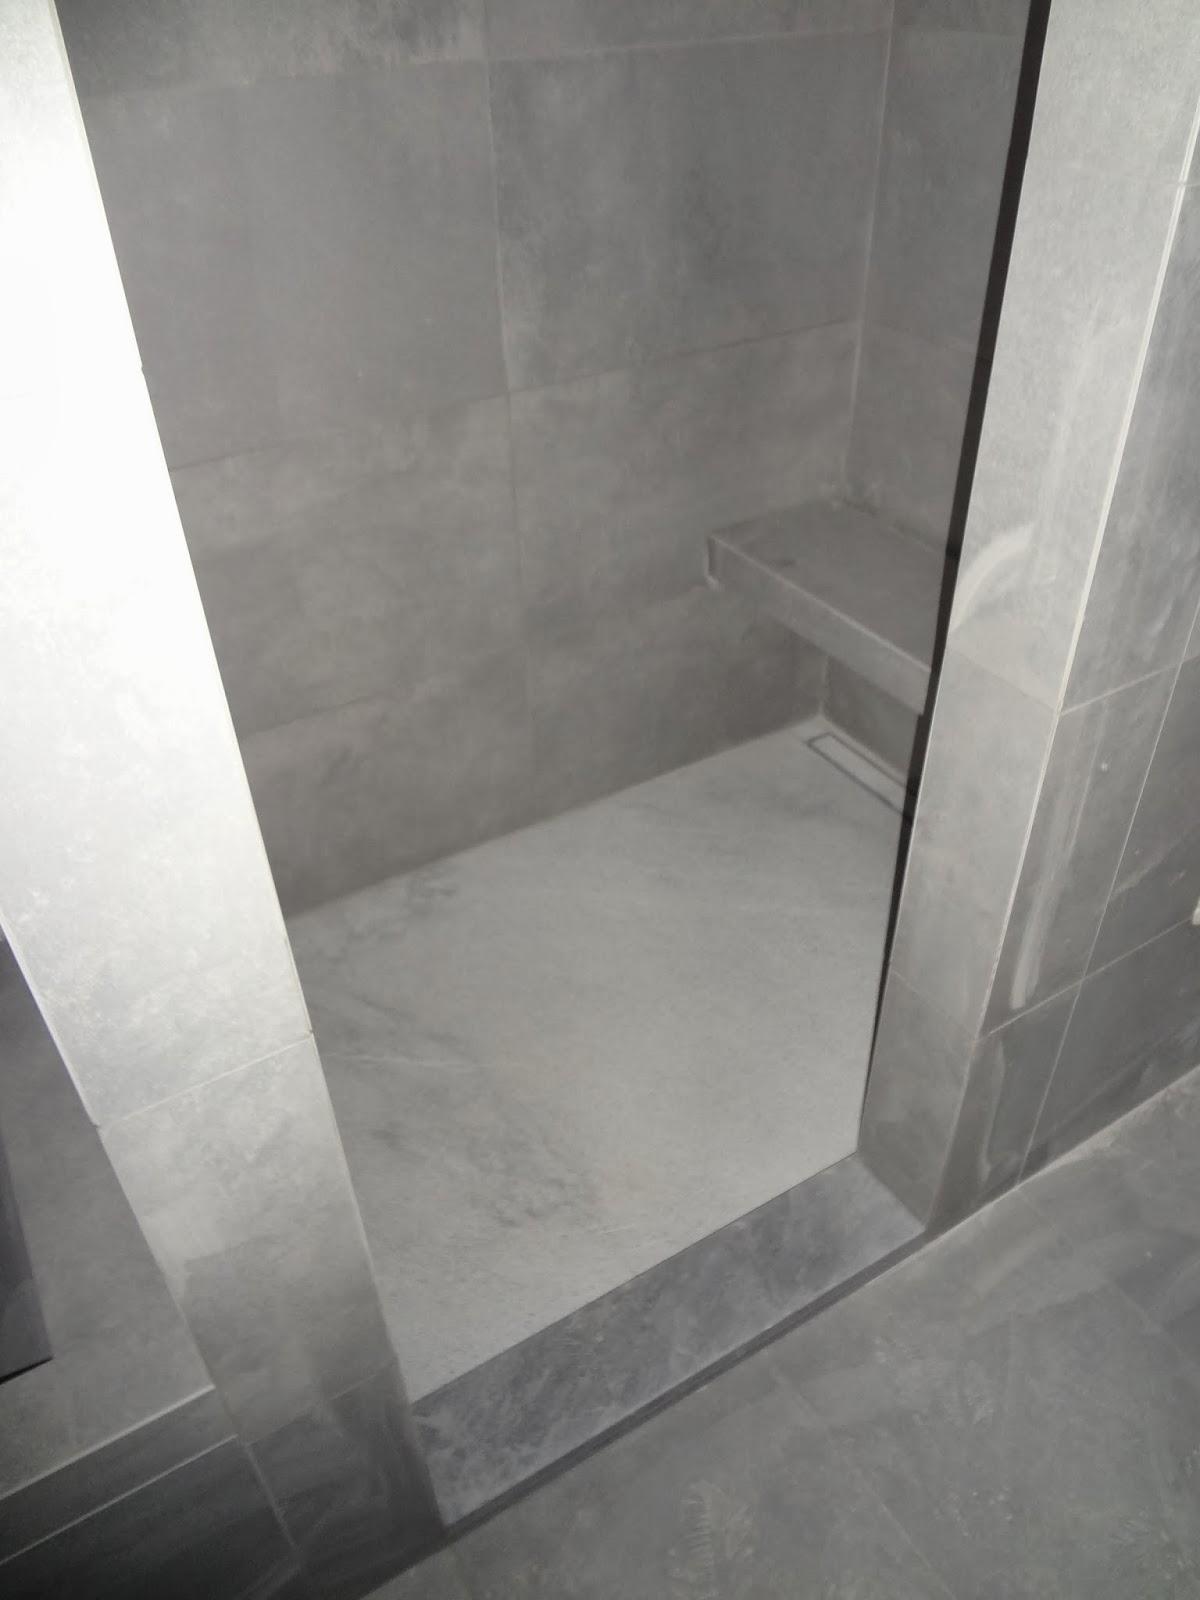 carrelage salle de bains prix la seyne sur mer tours. Black Bedroom Furniture Sets. Home Design Ideas